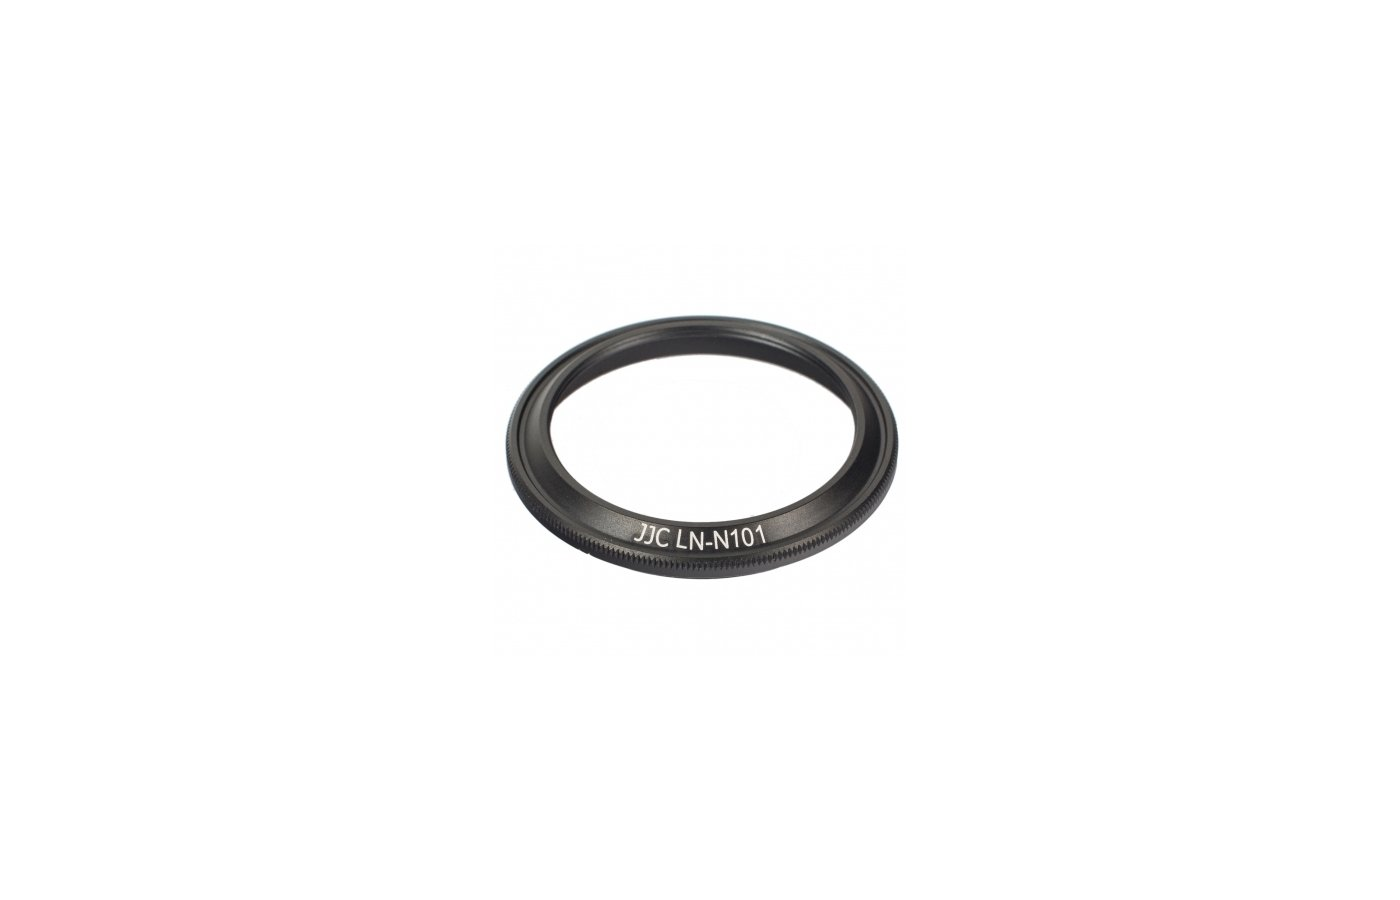 Бленда JJC LN-N101 для NIKON 1 NIKKOR 10-30mm f/3.5-5.6 VR